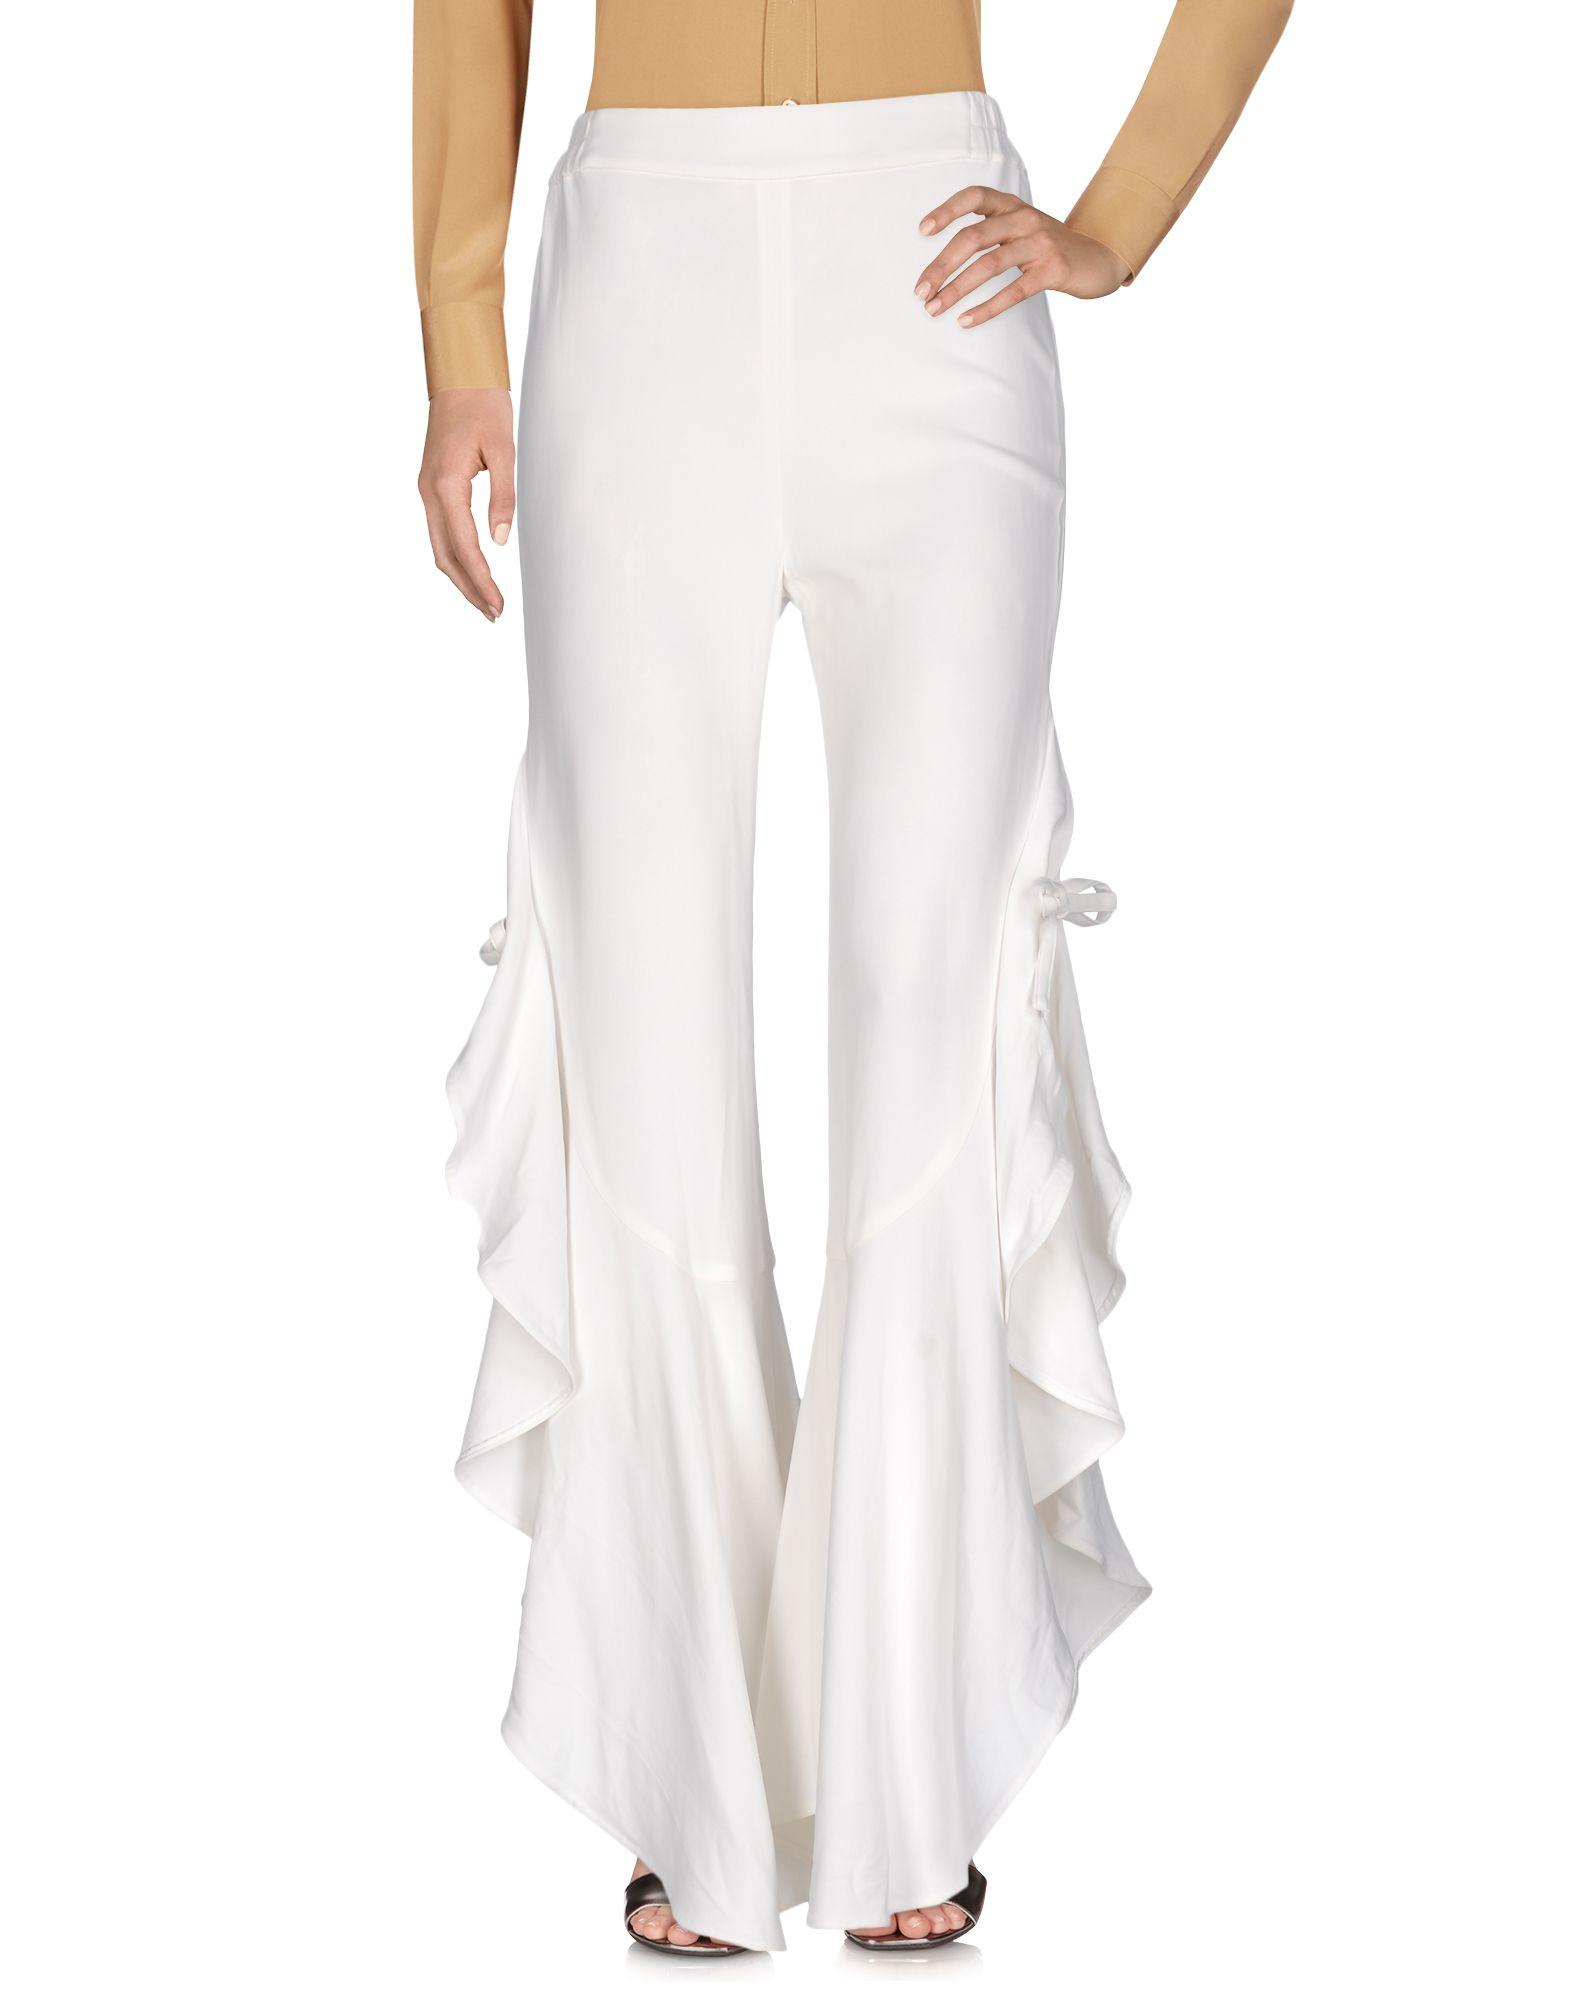 JONATHAN SIMKHAI Повседневные брюки jonathan simkhai длинная юбка